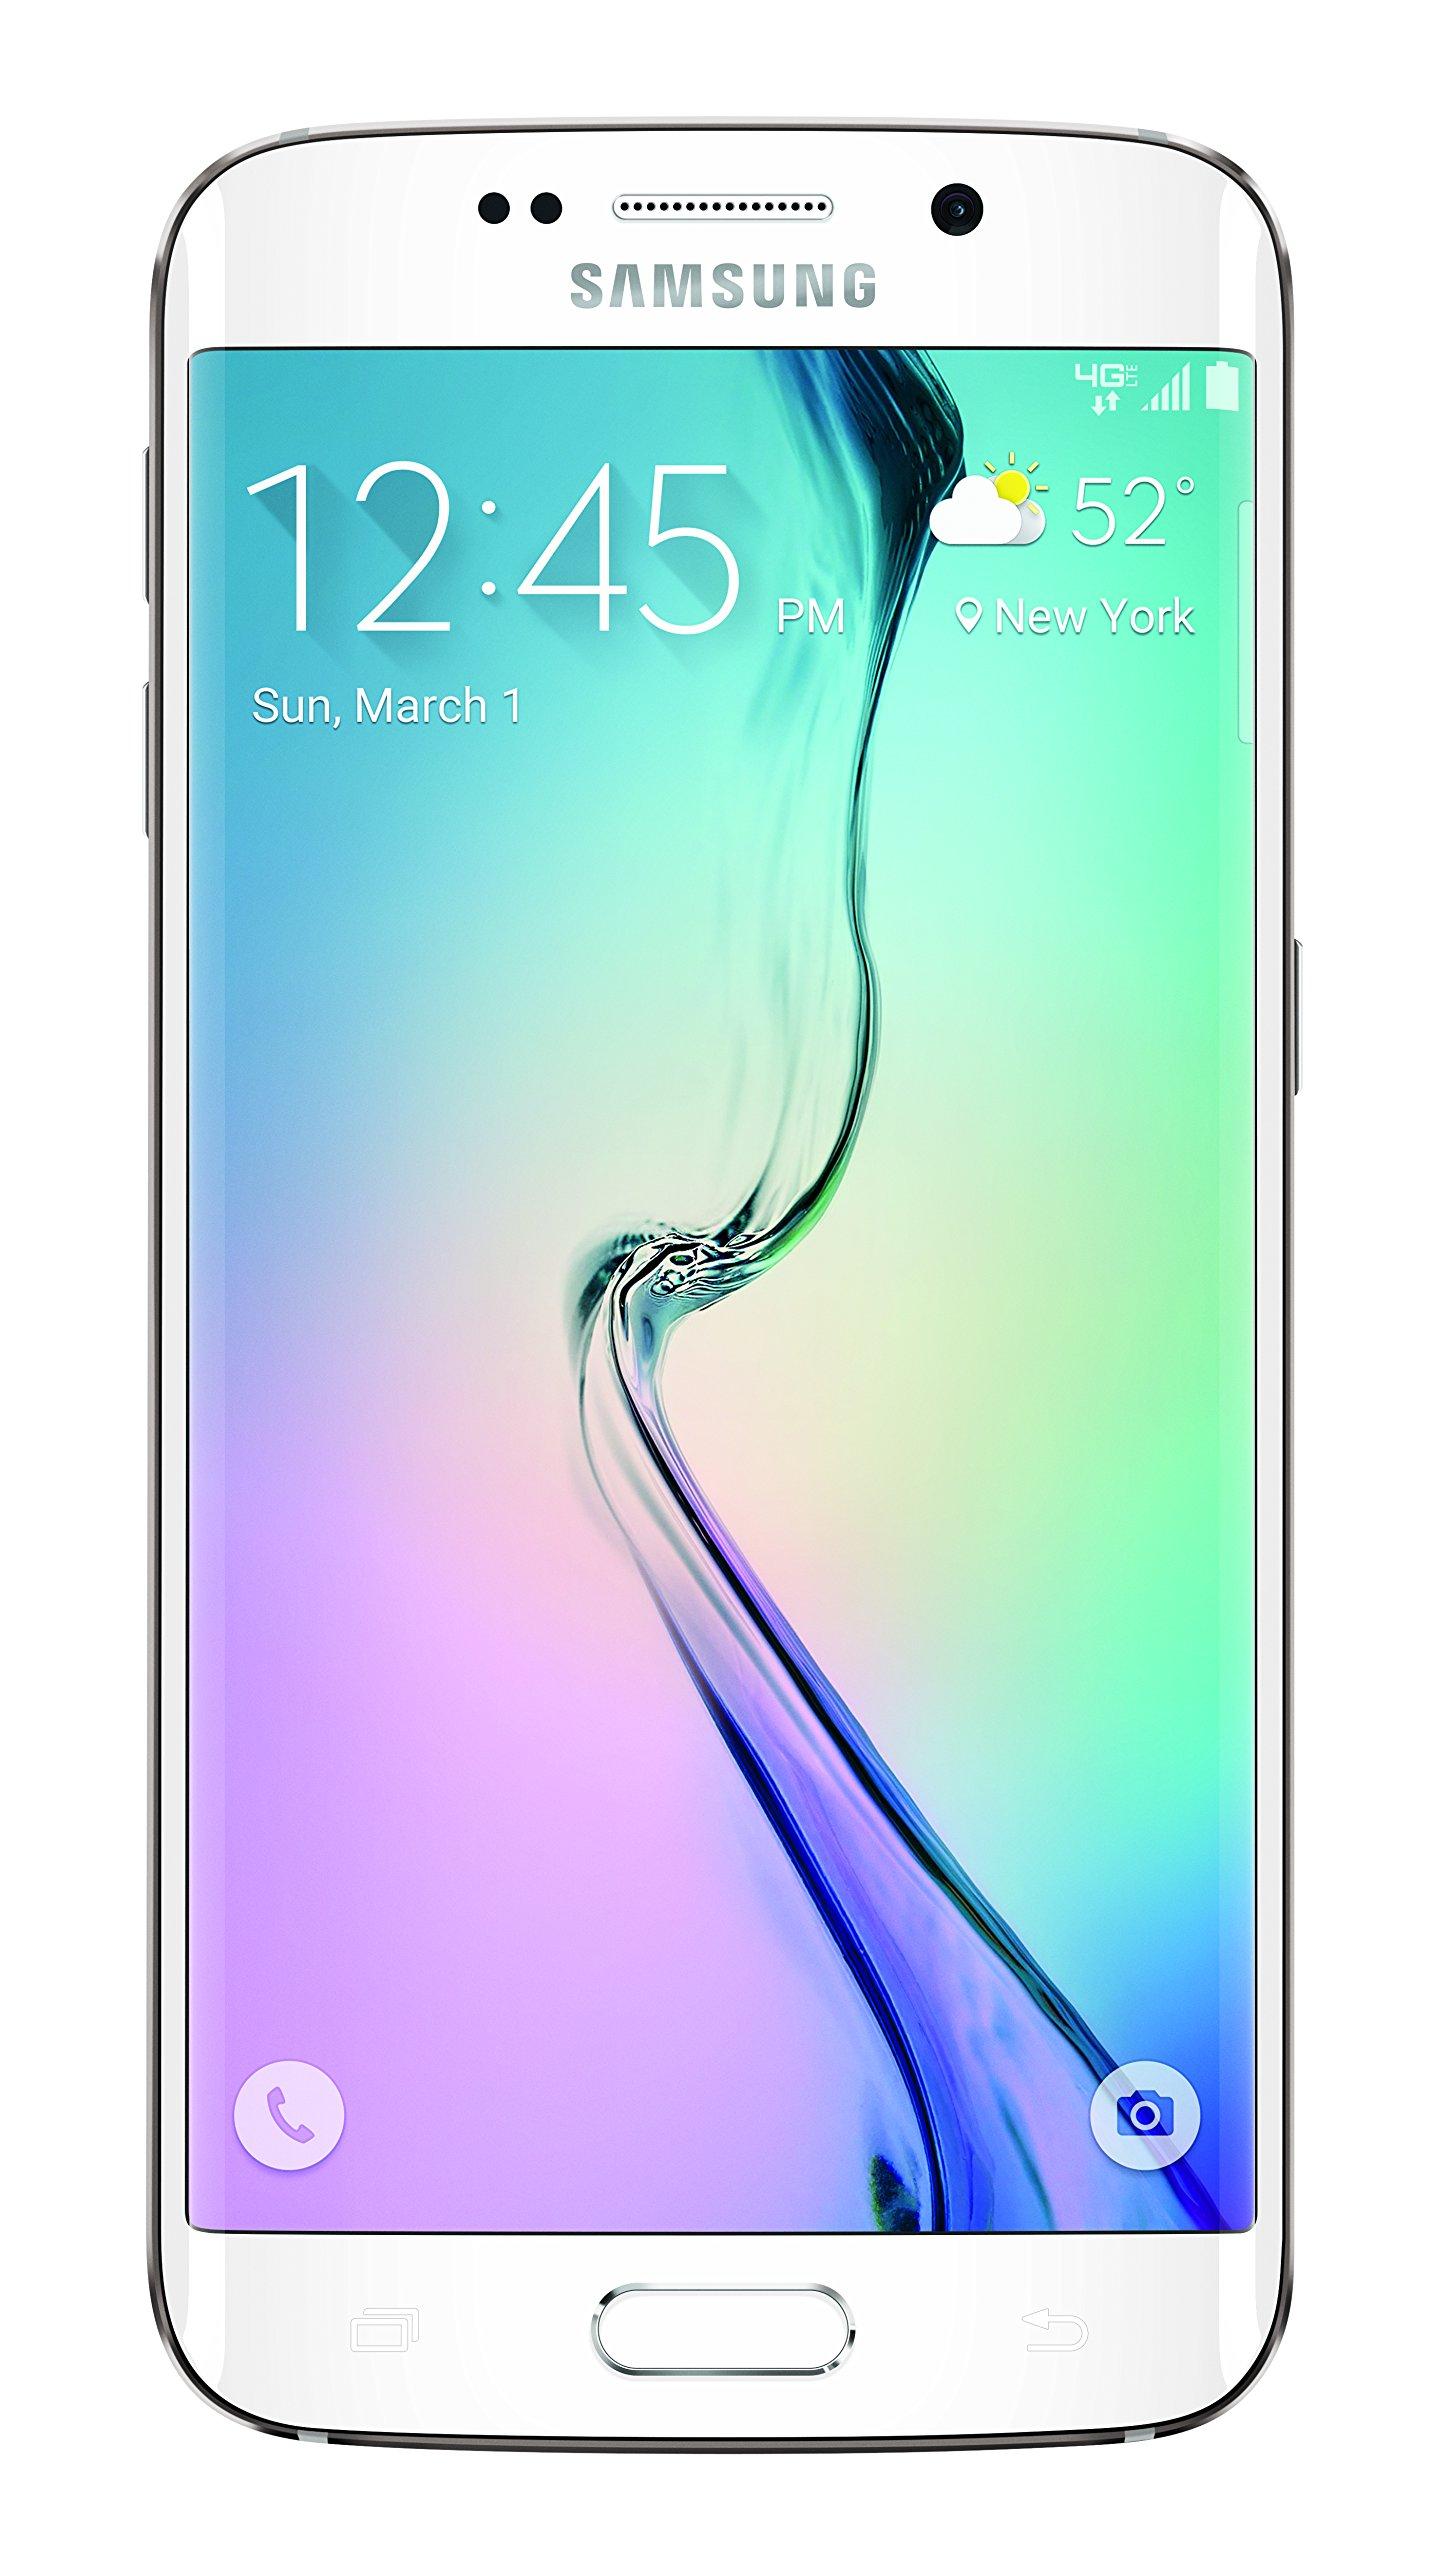 Samsung Galaxy S6 Edge, White Pearl 64GB (Verizon Wireless)